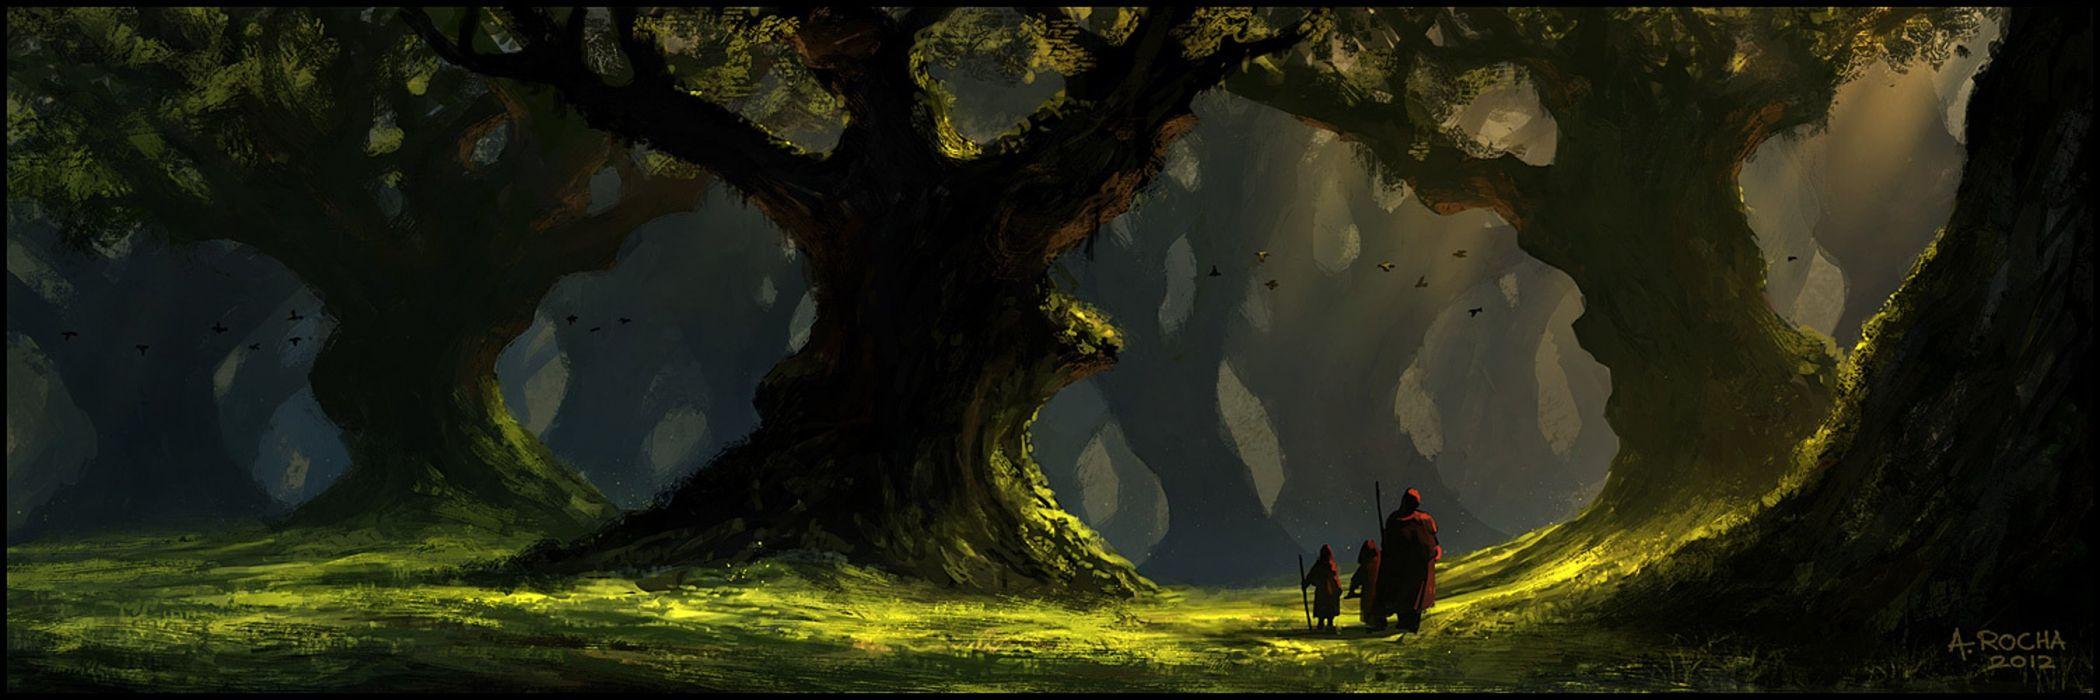 original fantasy landscape forest green wallpaper